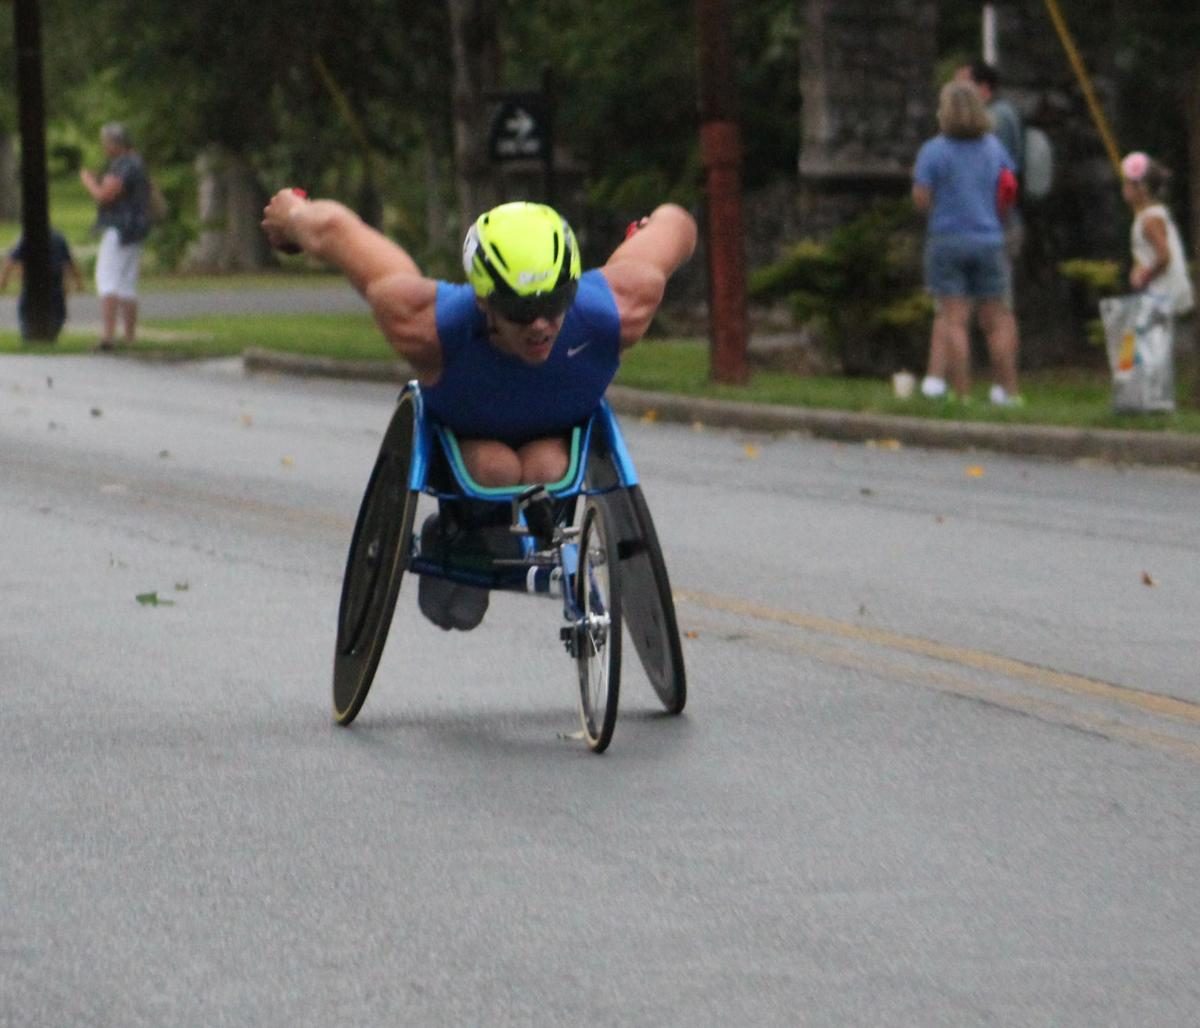 2017 Cedartown International Wheelchair 5K Road Race